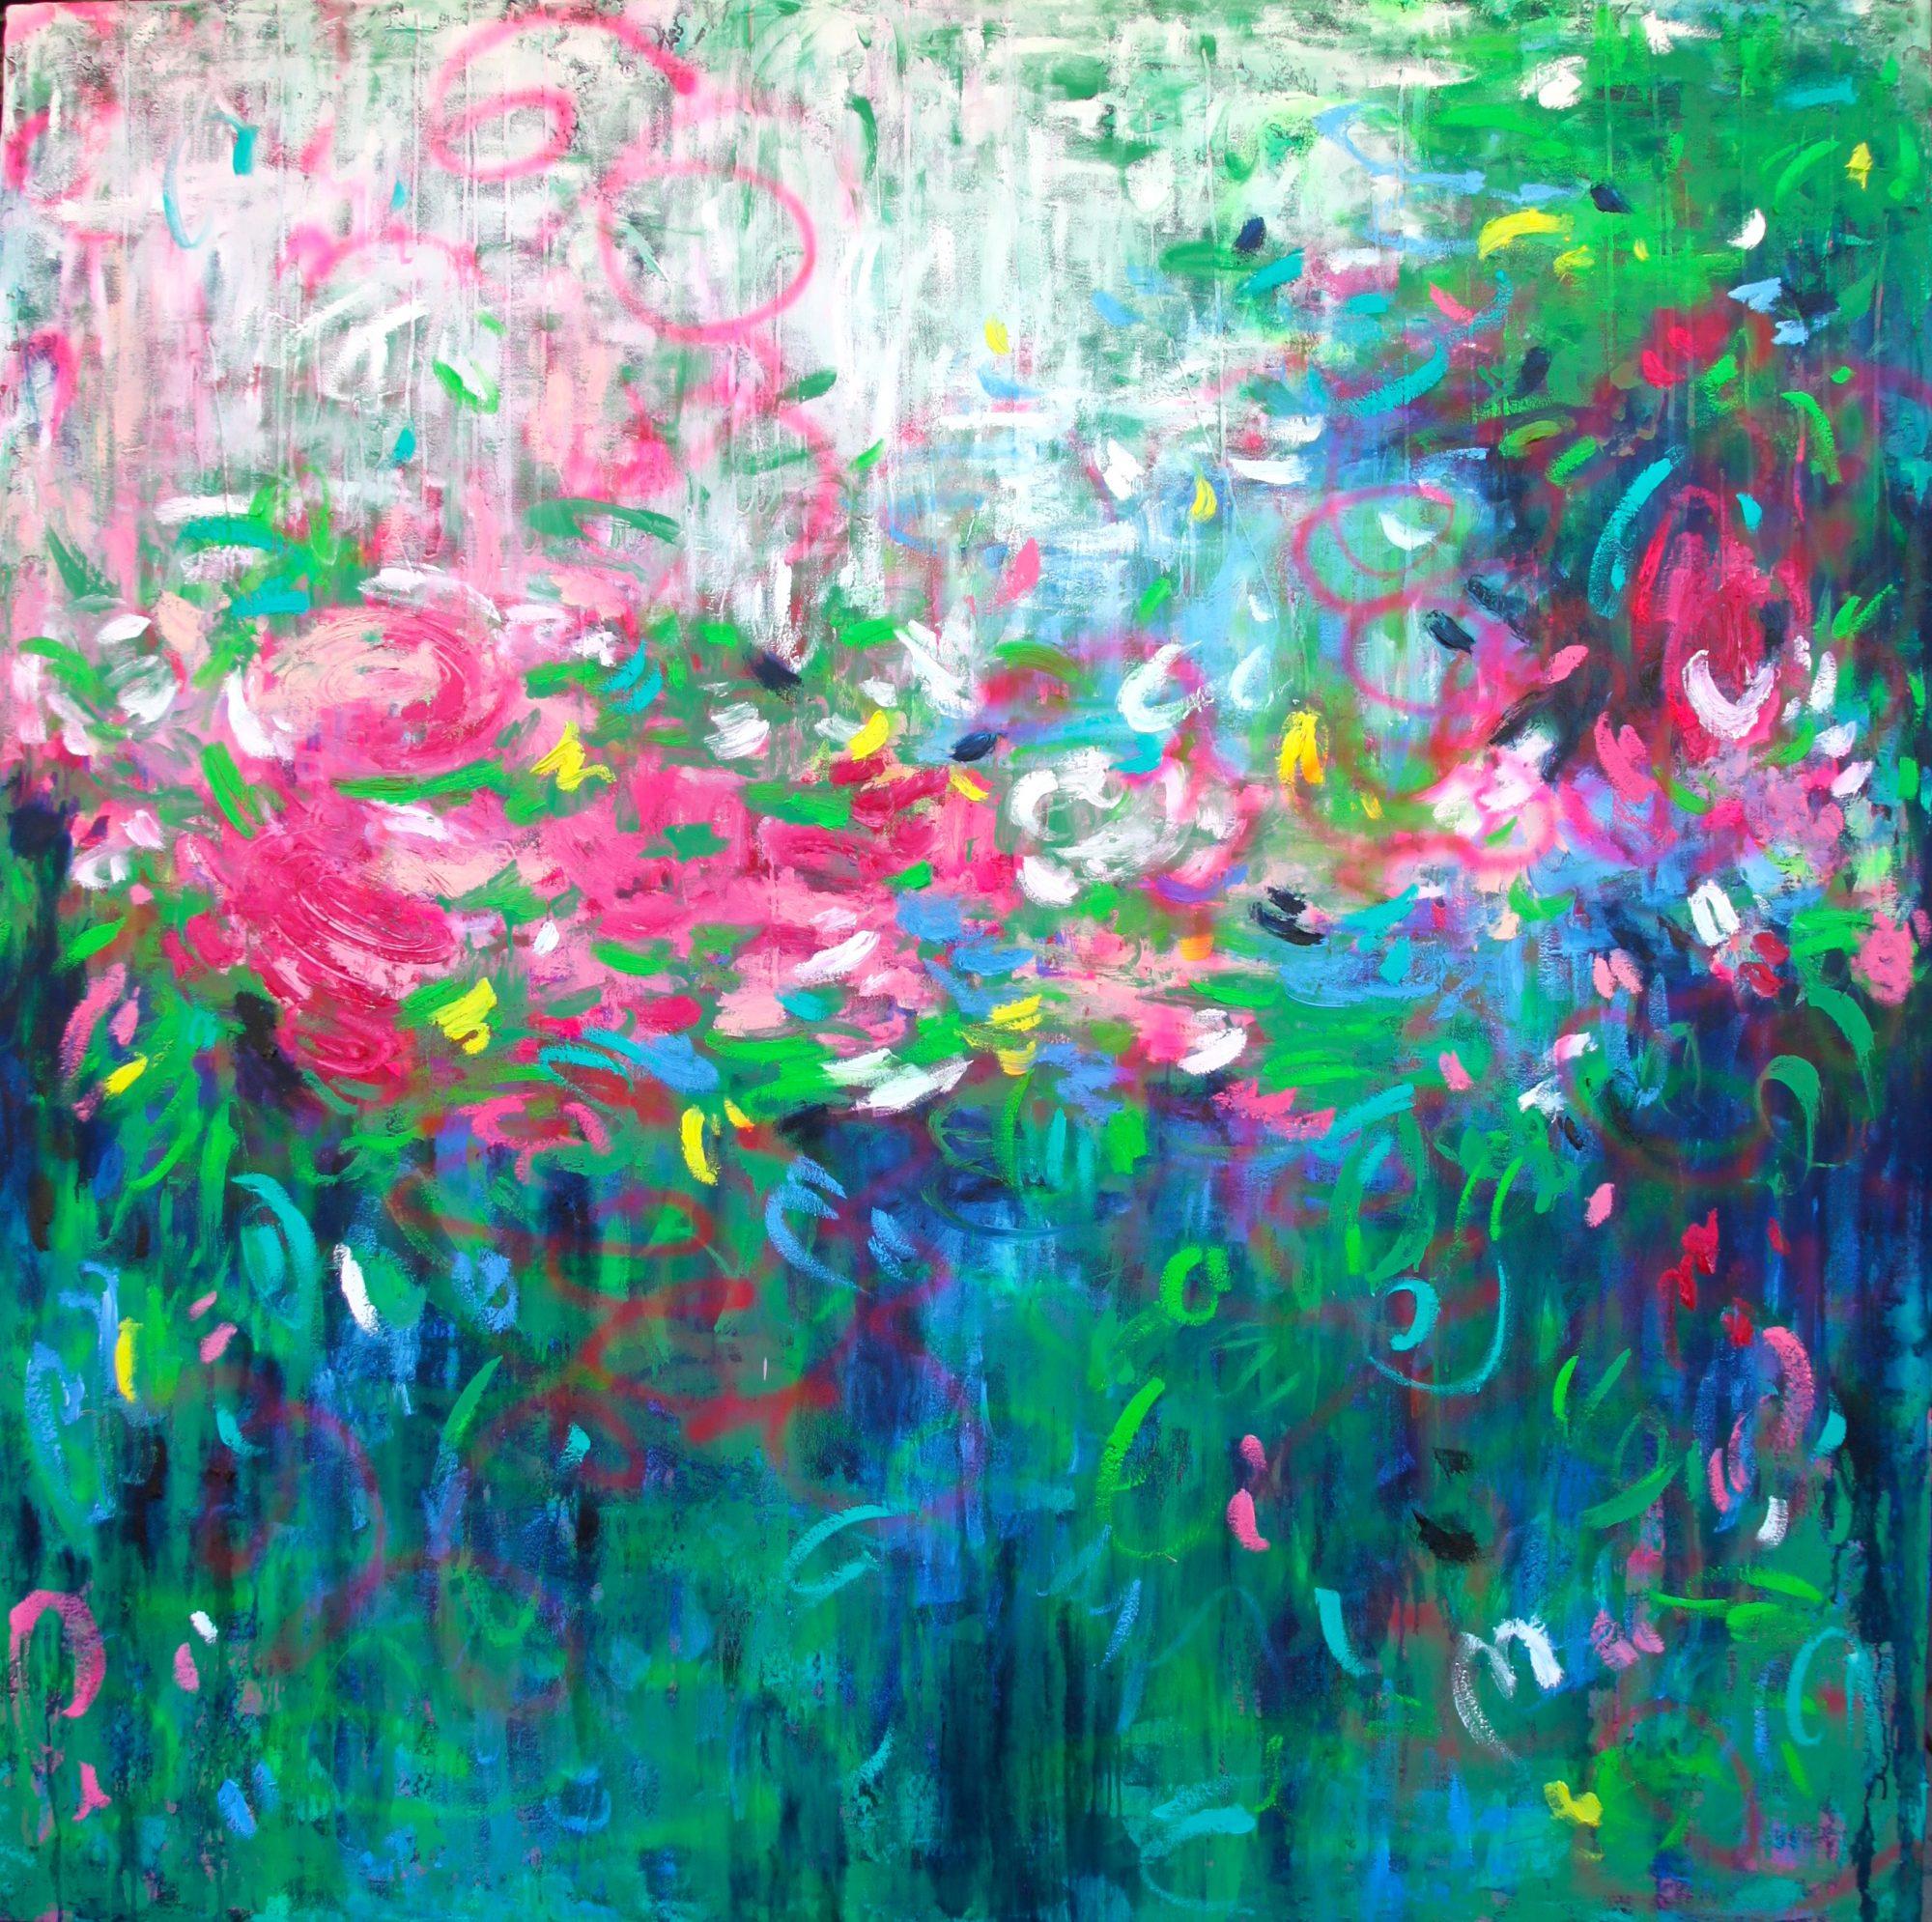 belinda-nadwie-art-abstract-painting-singing heart 2